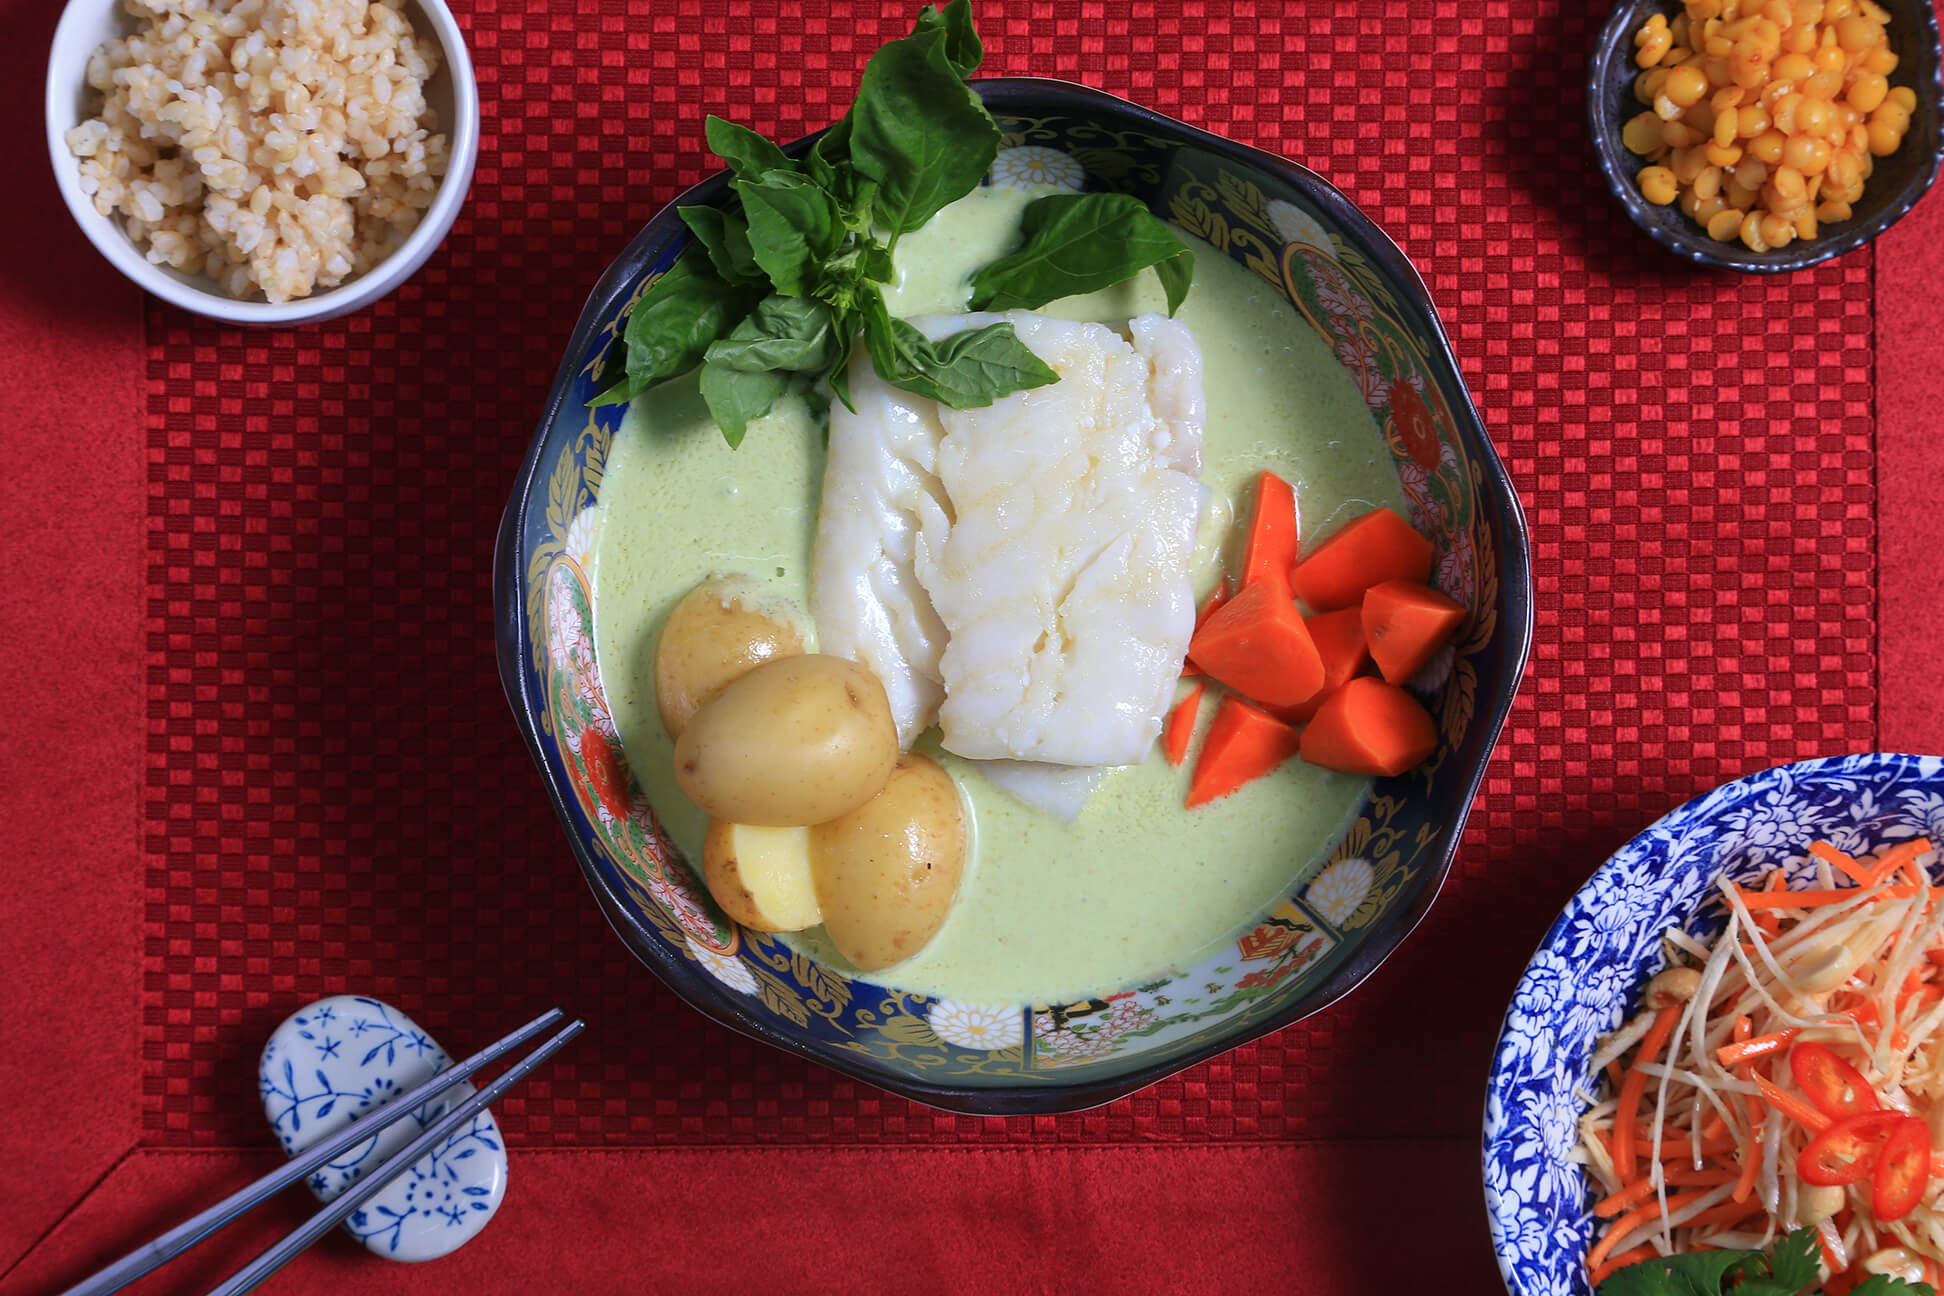 greenmake-food-photography9.jpg